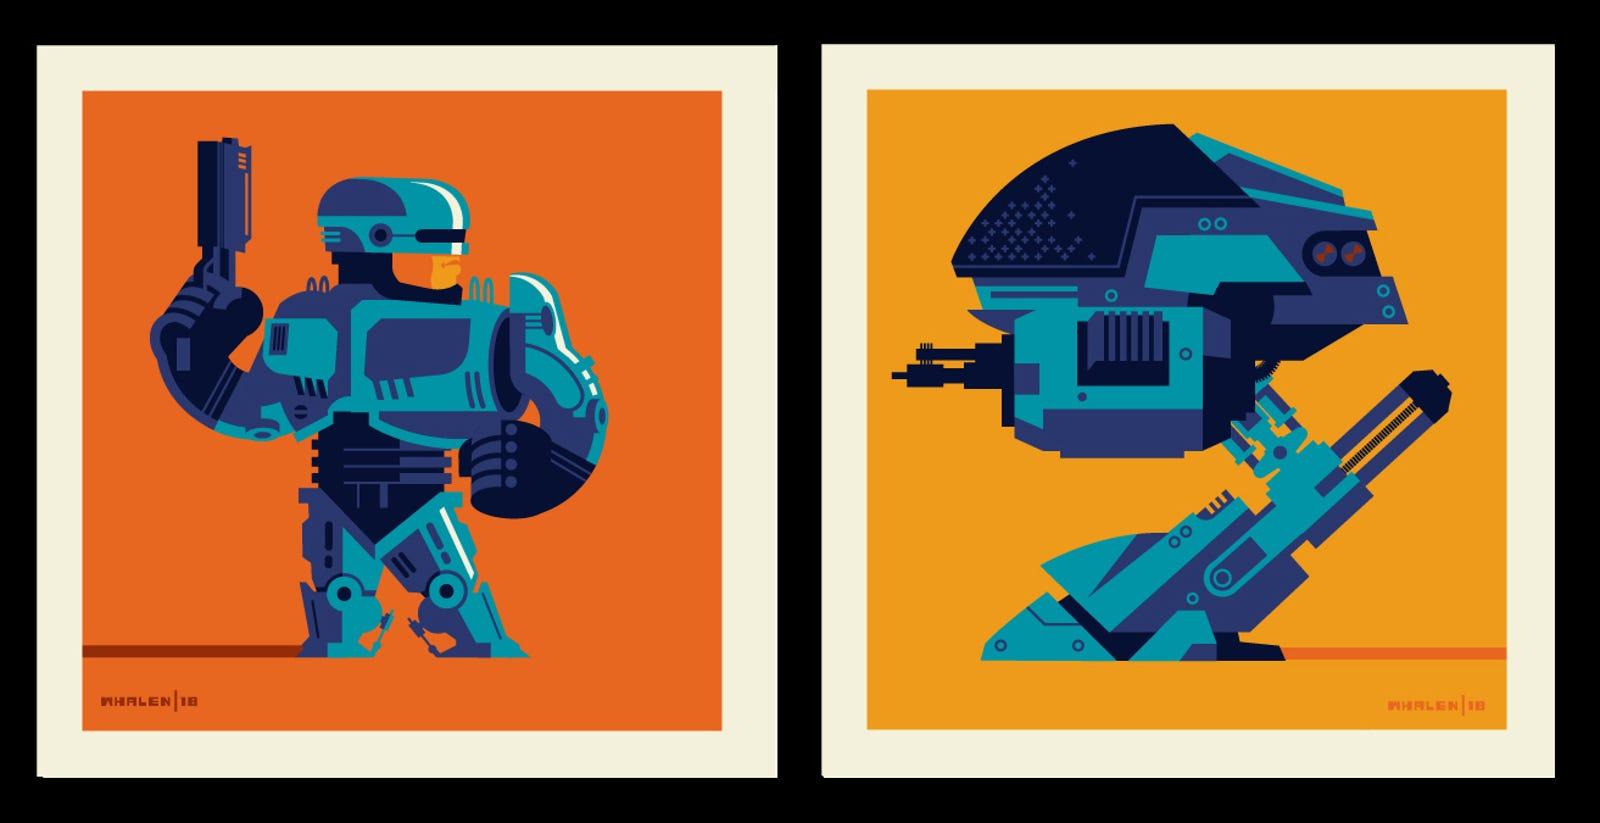 Robocop vs. ED 209 by Tom Whalen